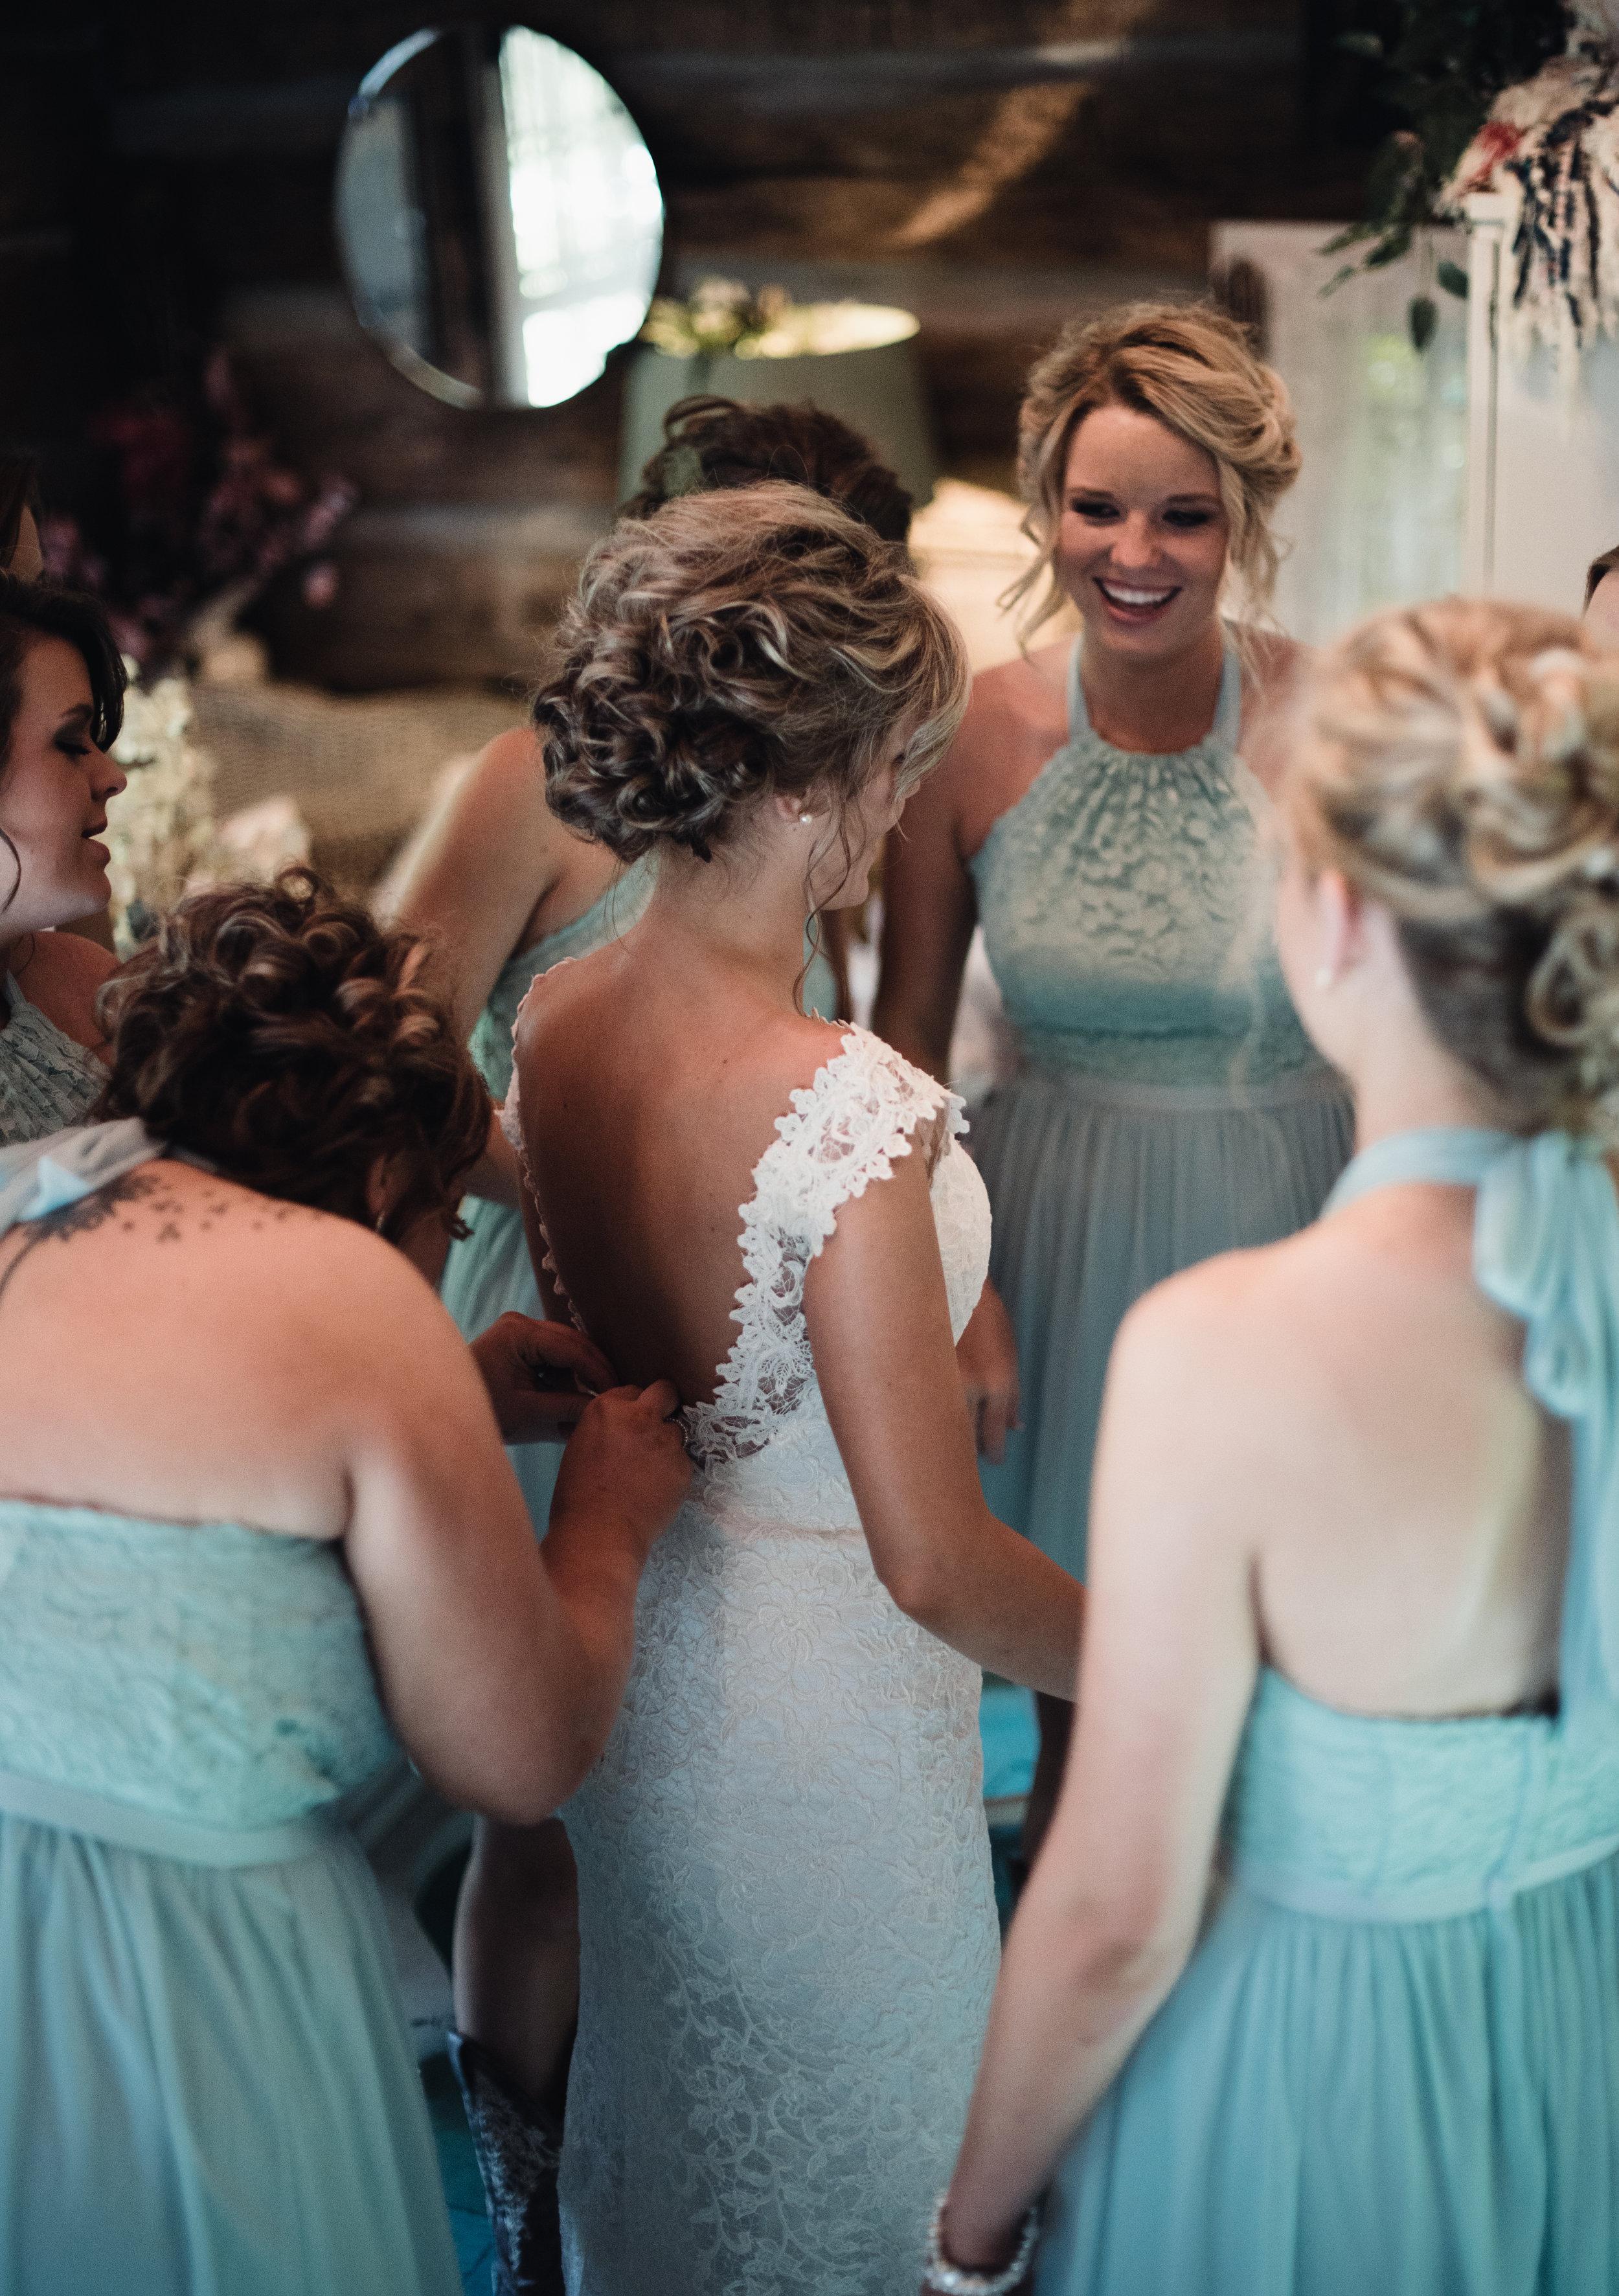 echo-hollow-virginia-wedding.jpg